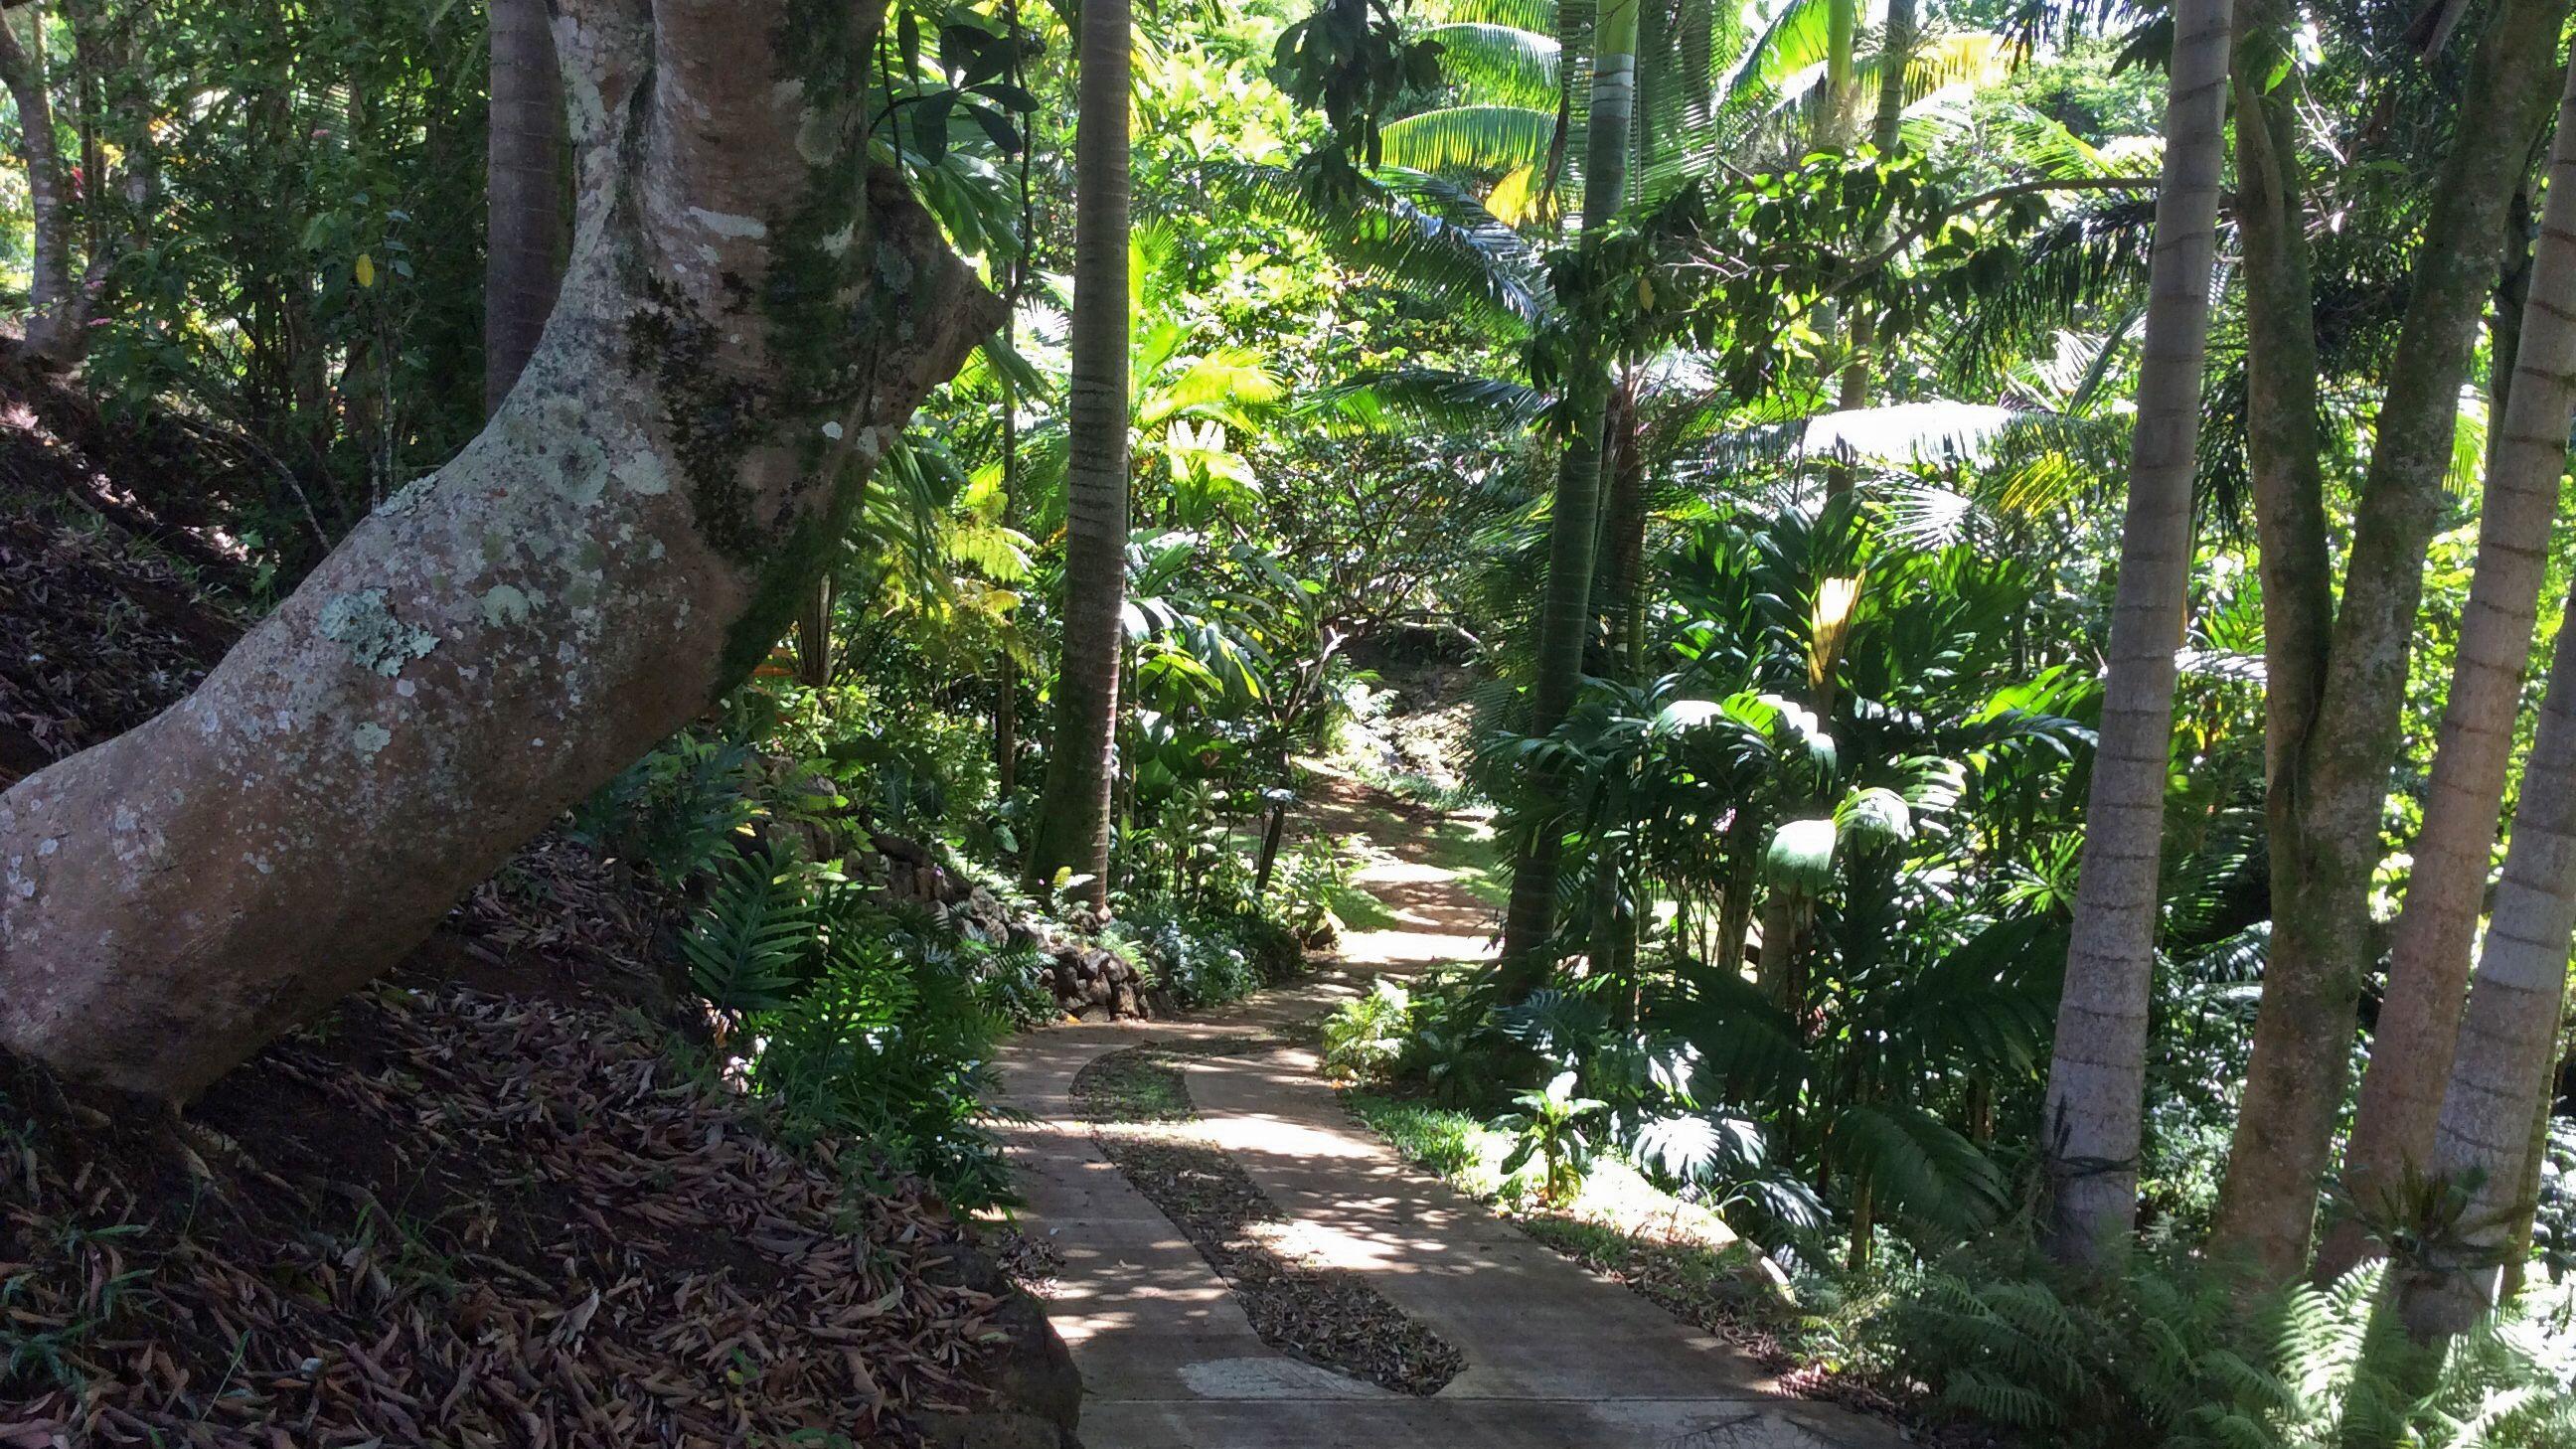 Forest scene in Kauai